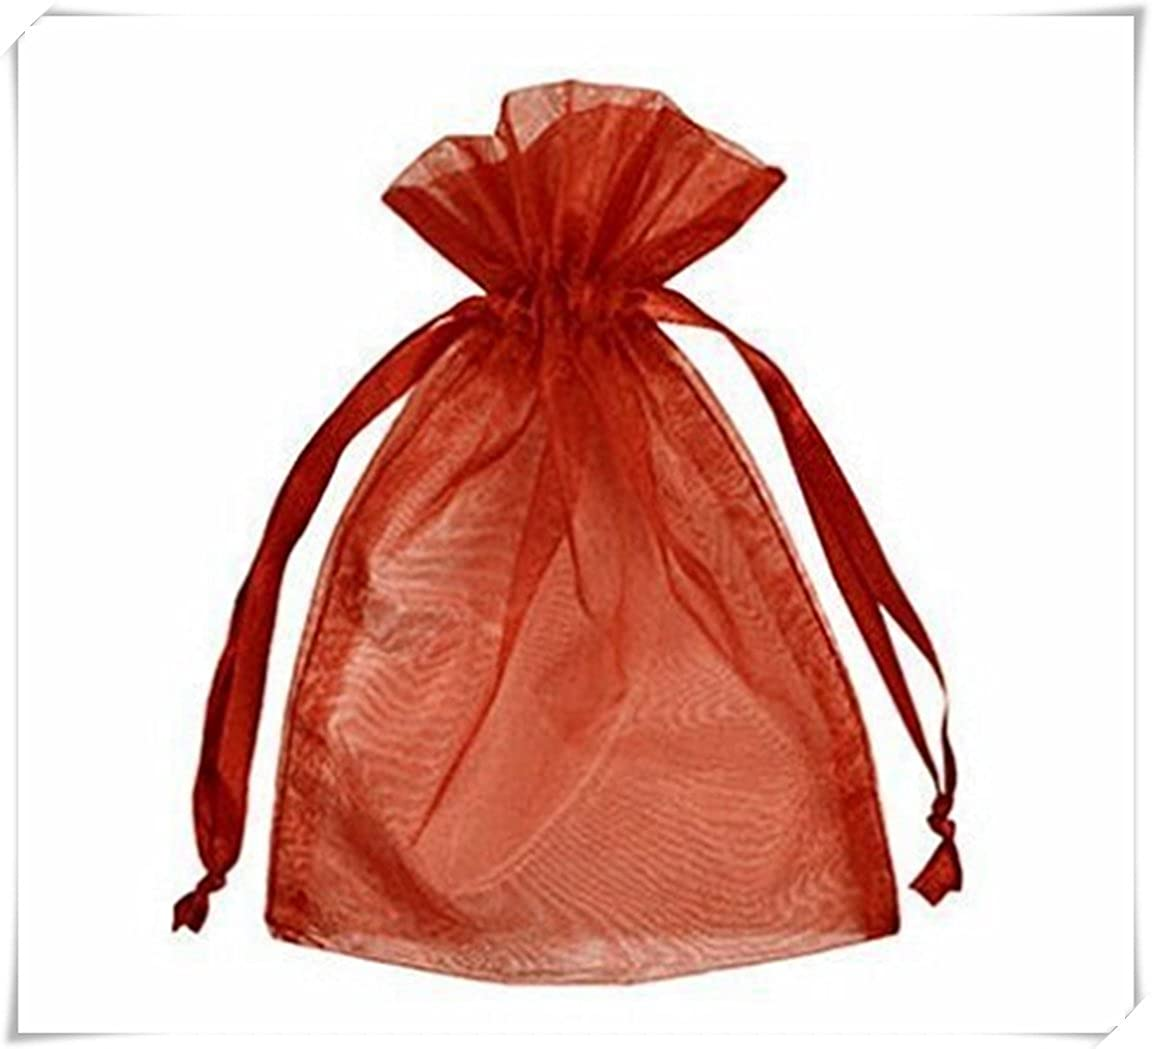 Superbe Pissenlit OM Symbole AUM Namaste Yoga support de sac Parapluie Cintre